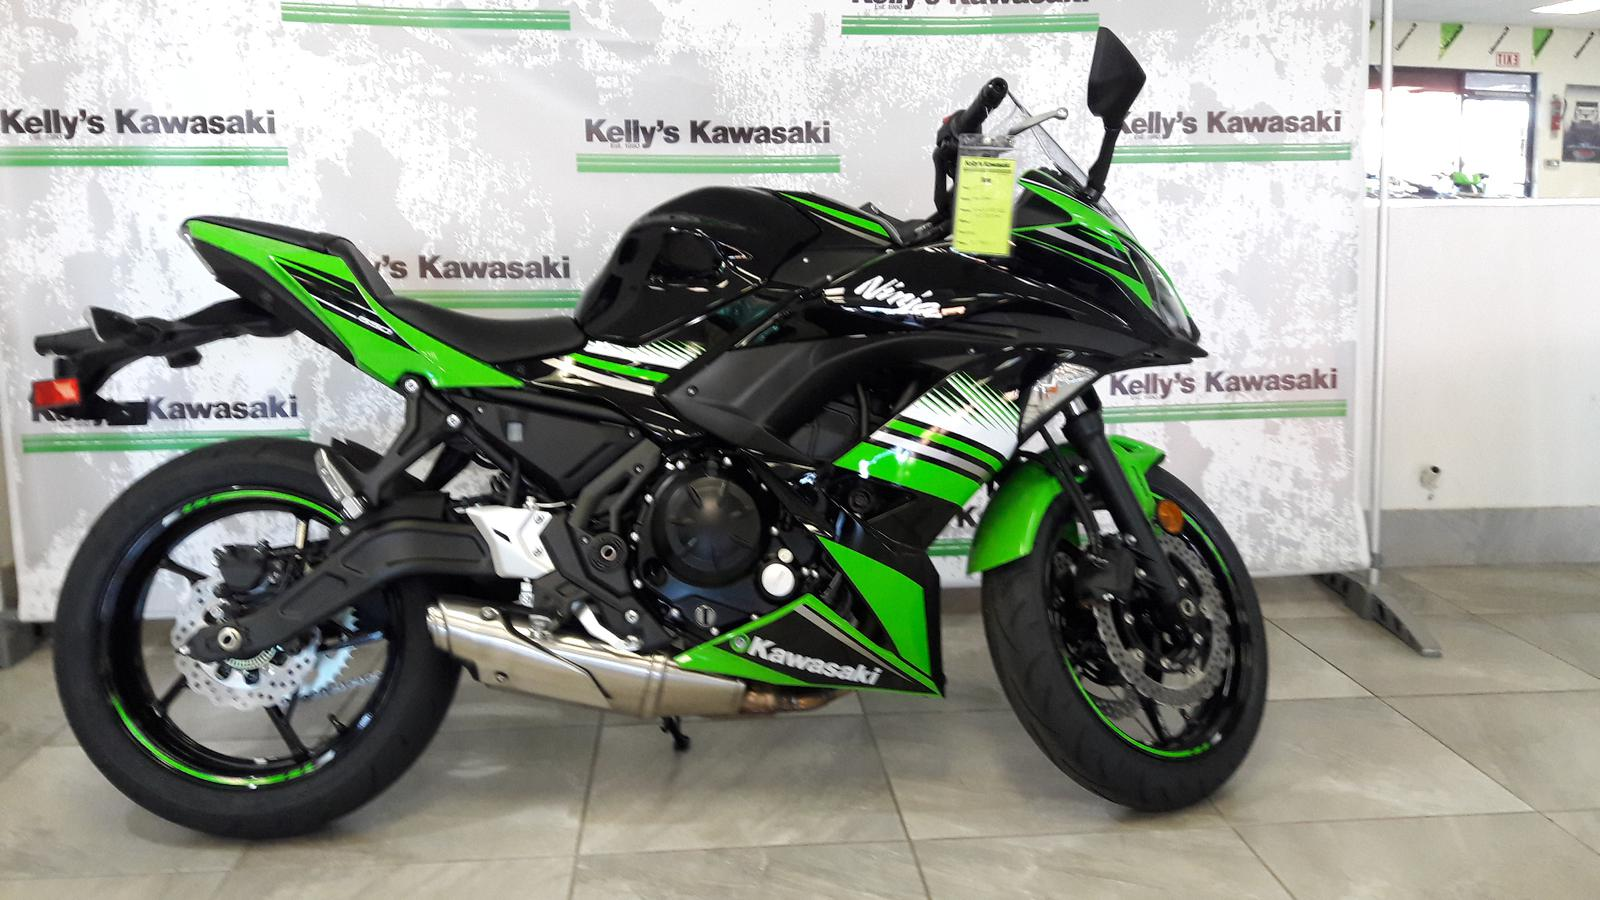 2017 Kawasaki Ninja 650 - ABS KRT Edition for sale in Mesa, AZ ...